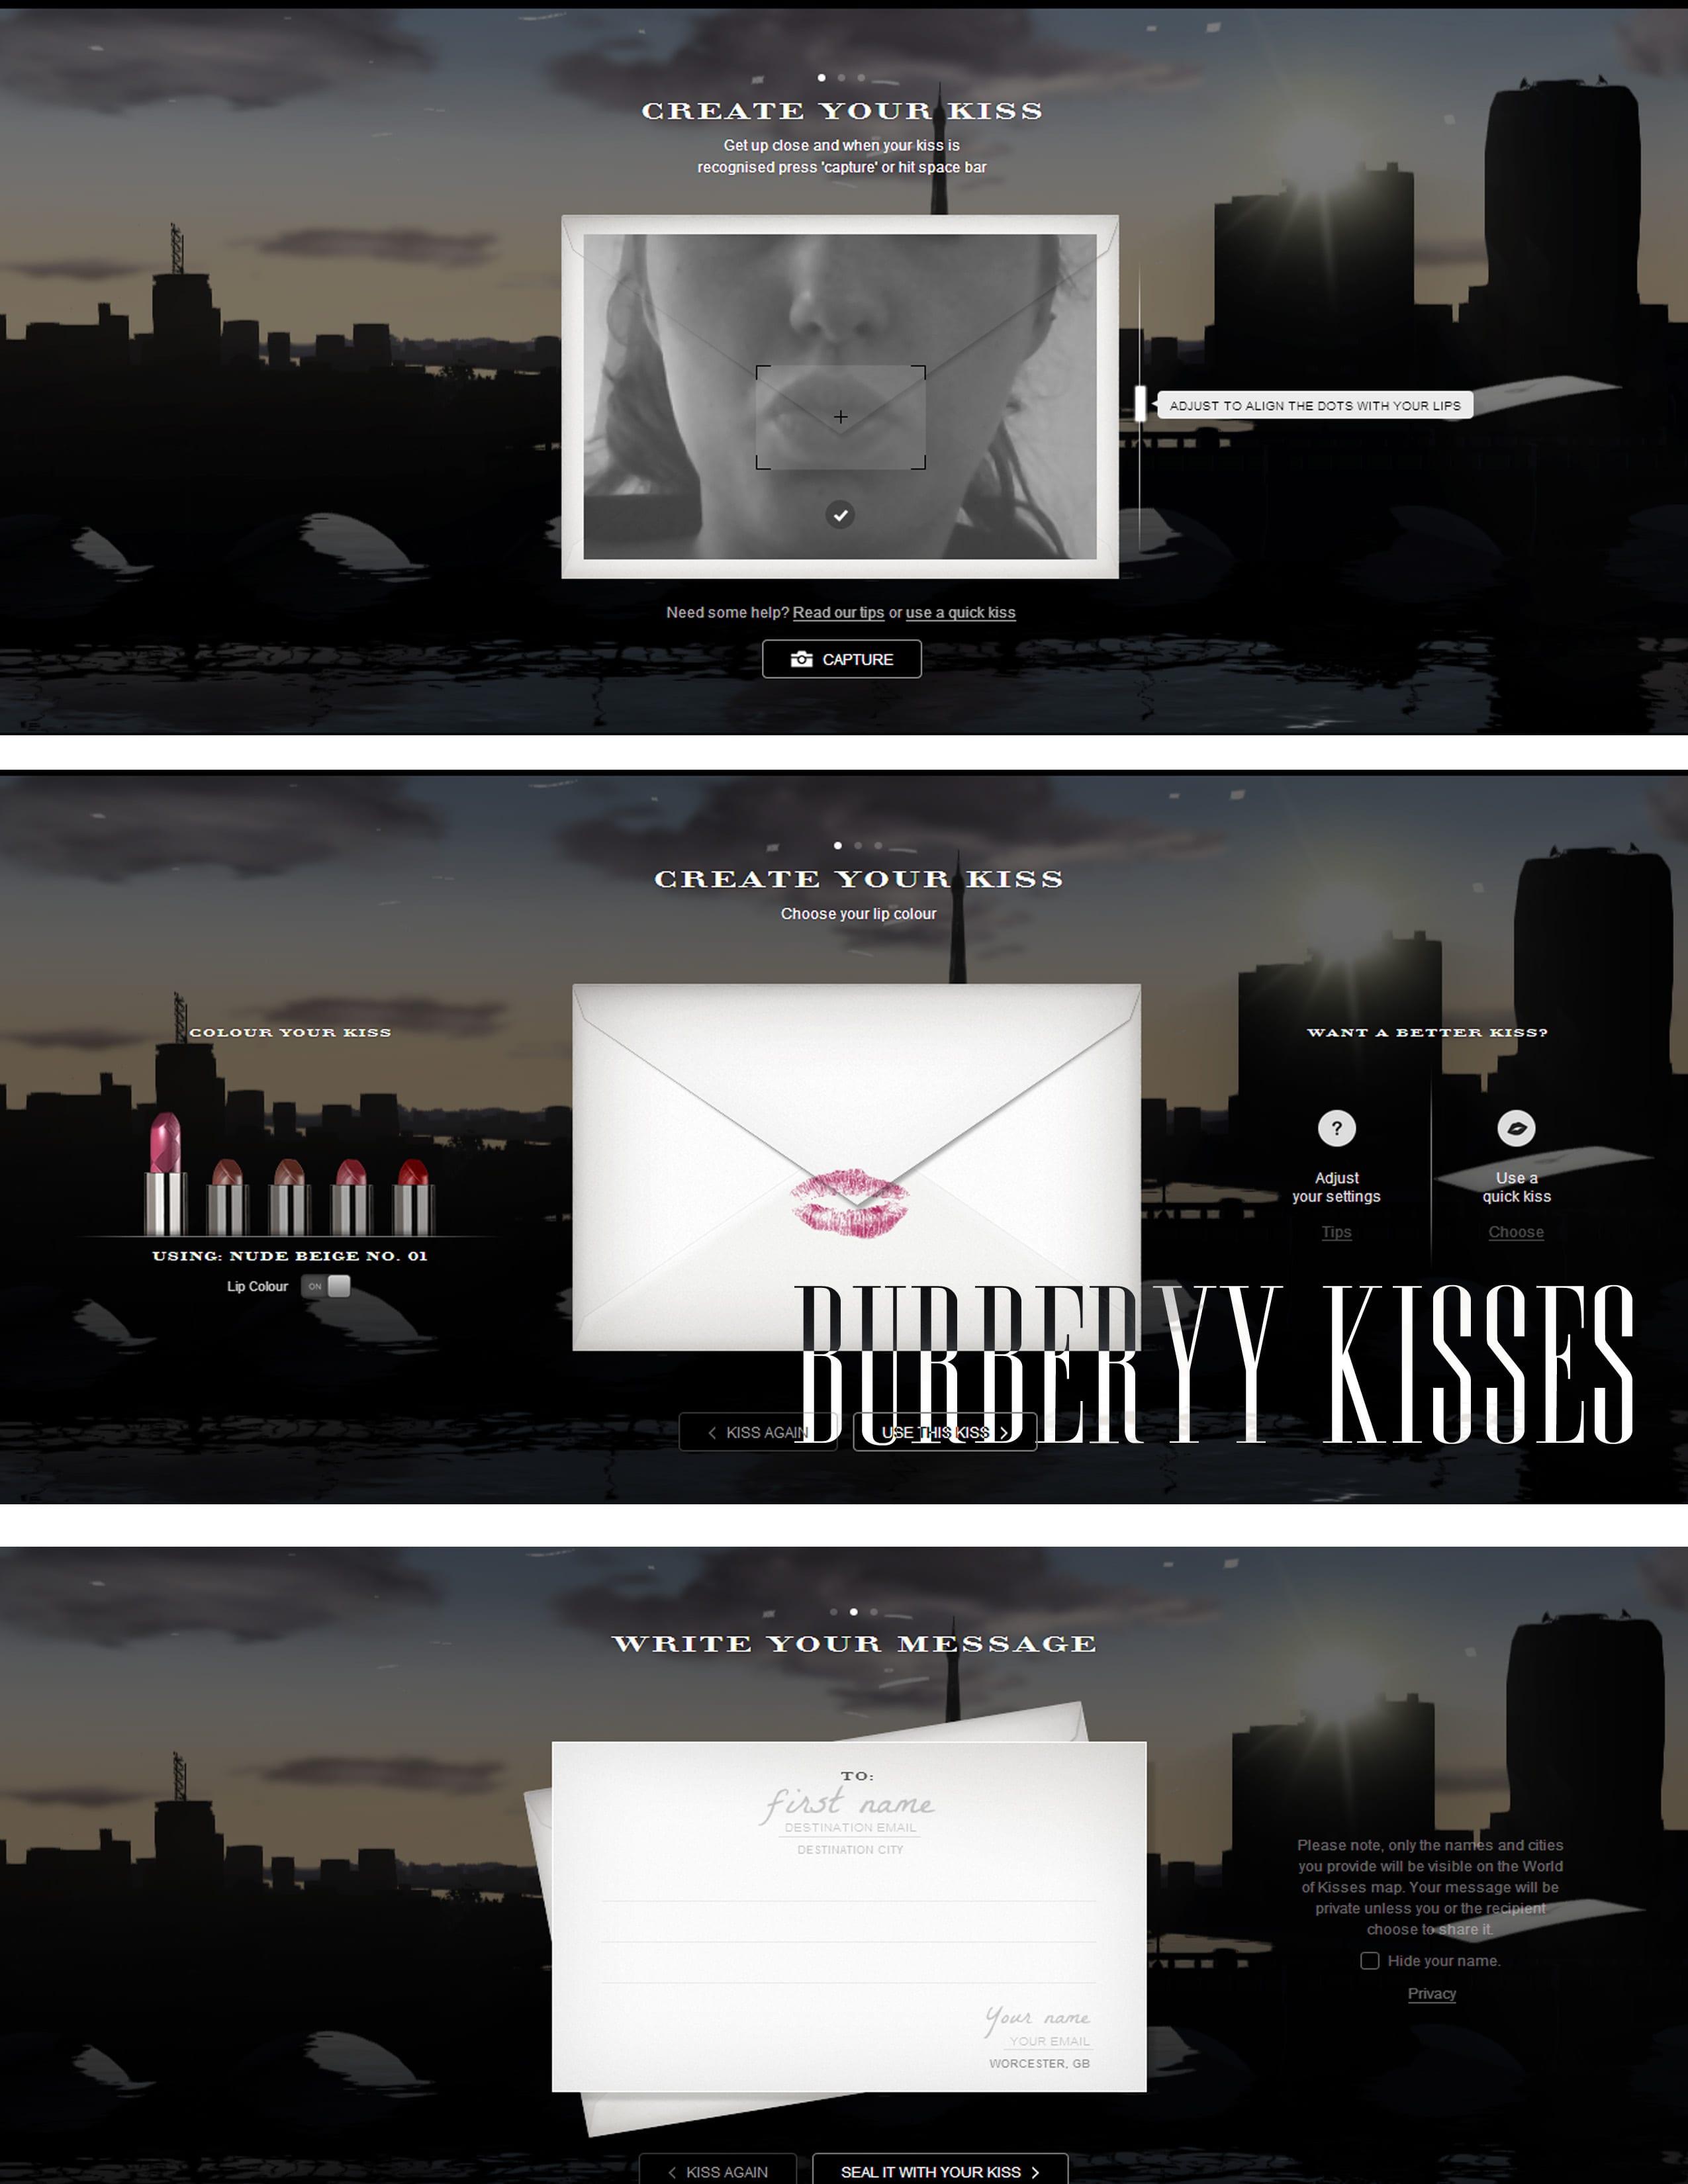 Burberry kisses